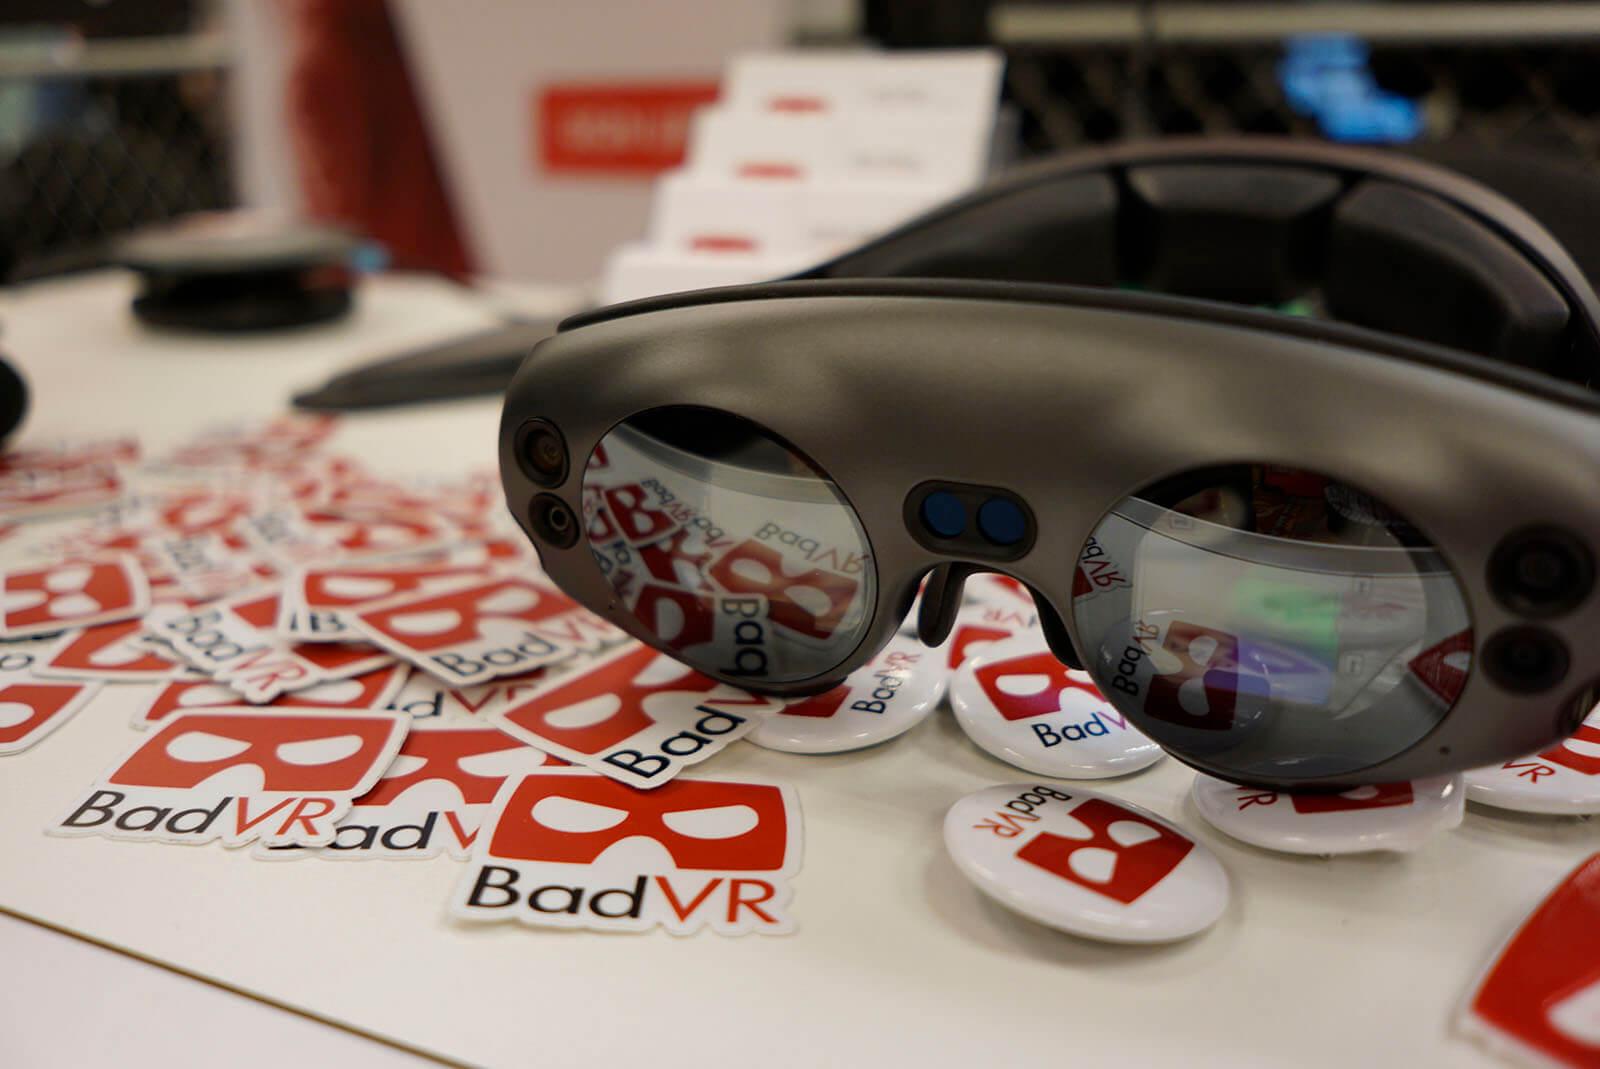 BadVR logos and VR goggles